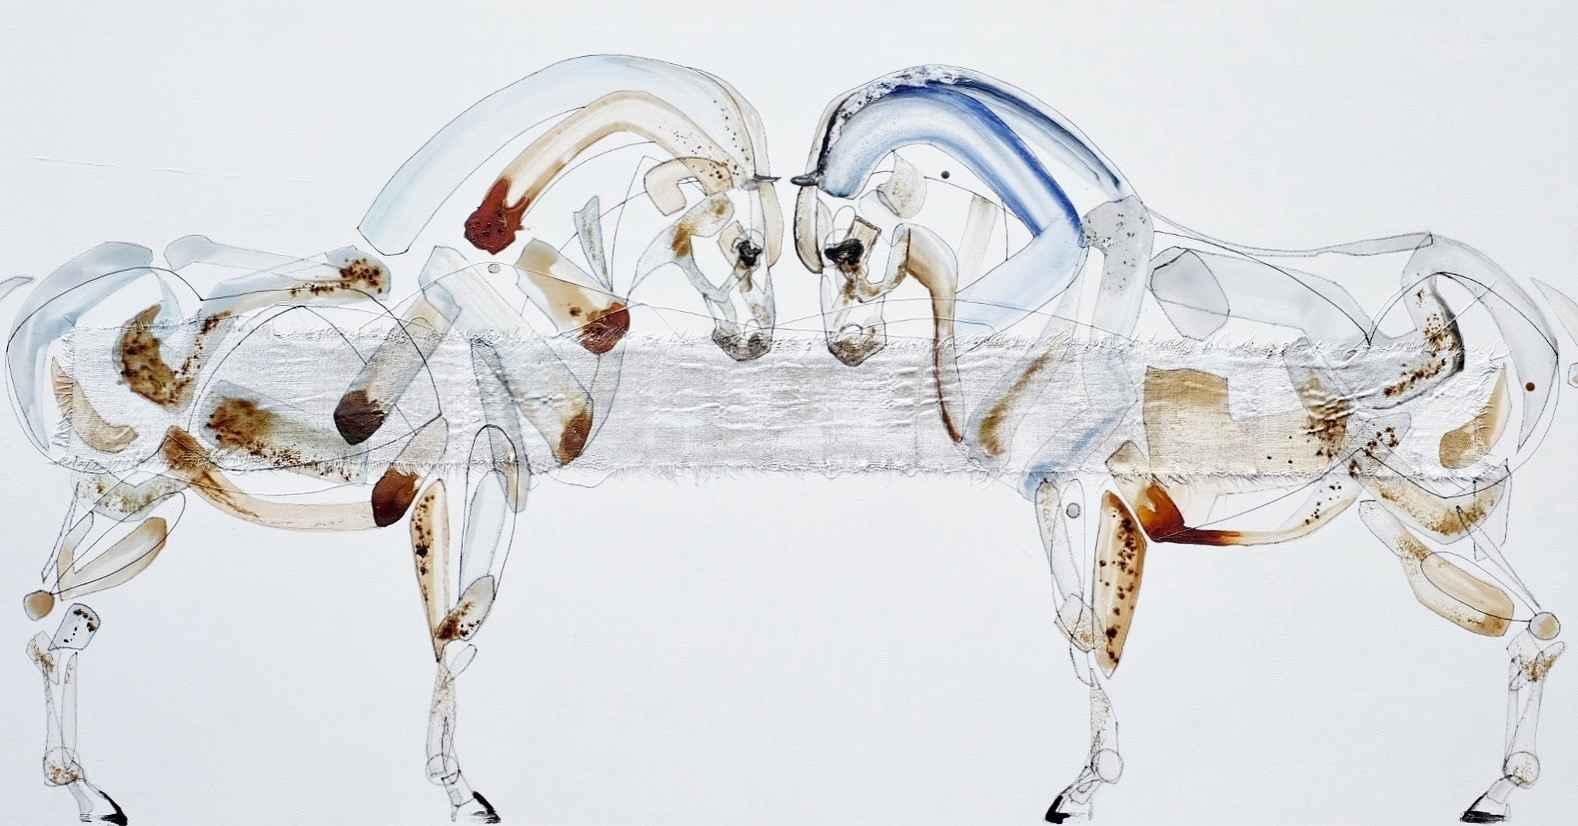 Simpatico by  Jessica Potenza - Masterpiece Online